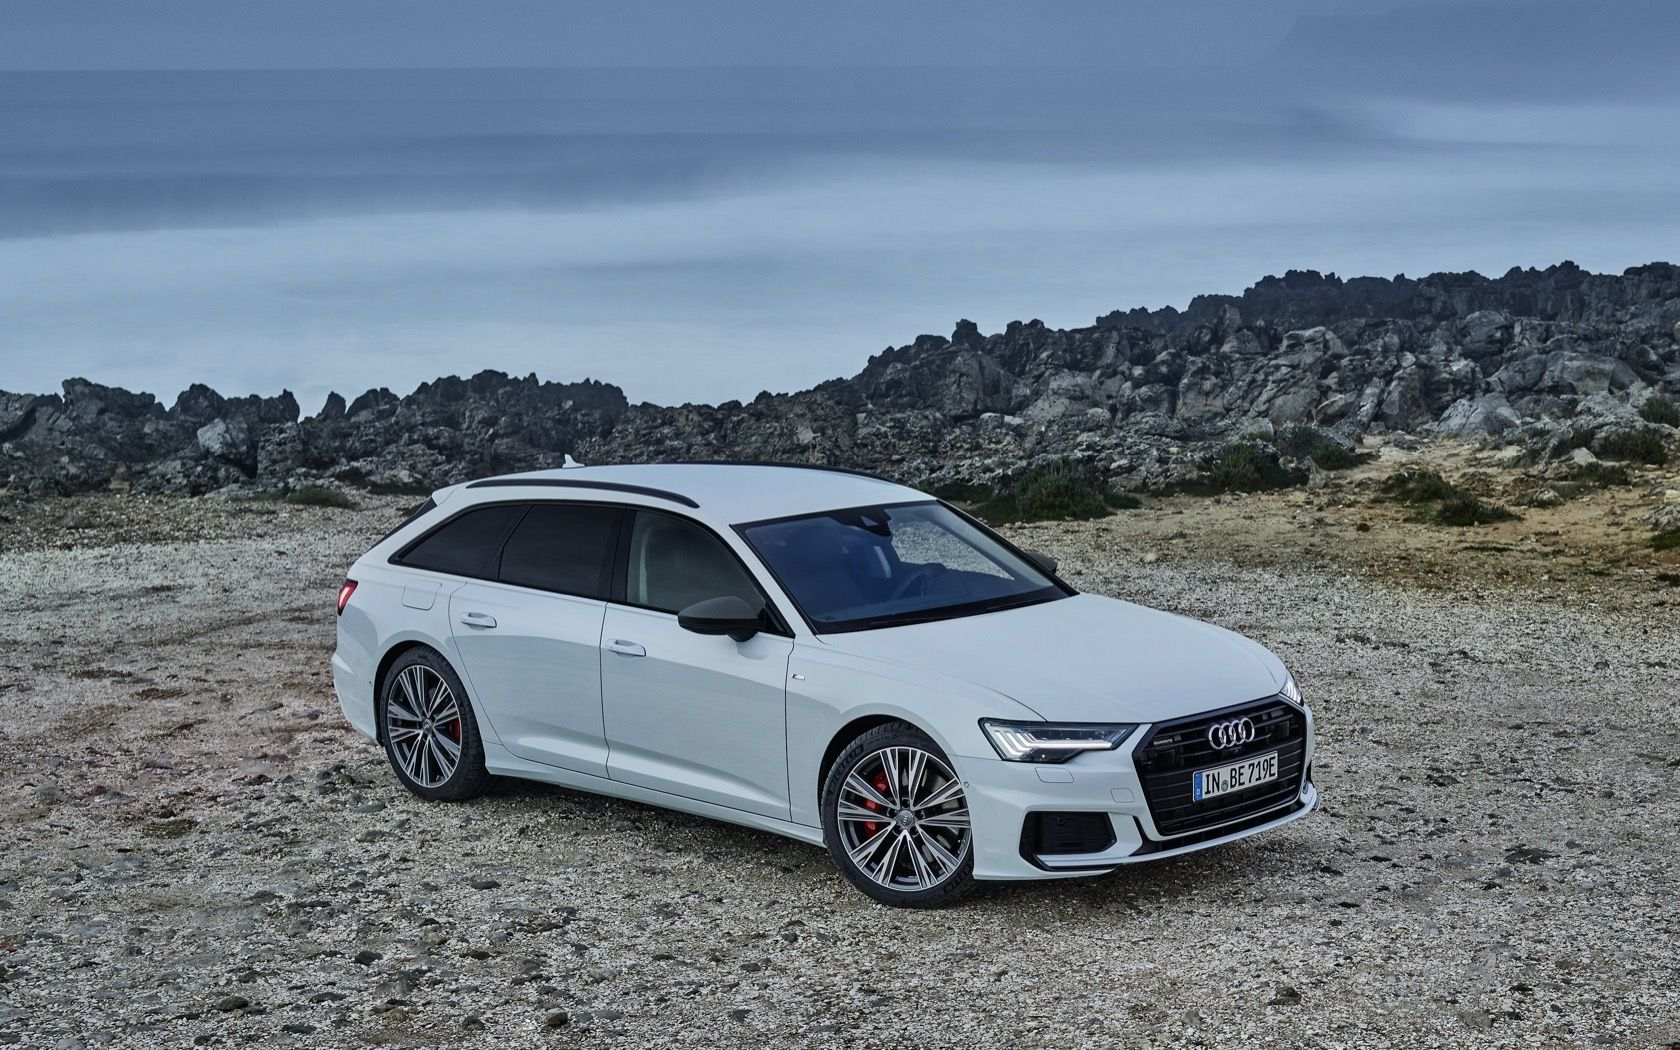 2020 Audi A6 Avant 55 Tfsi E Quattro Makes Stunning Wagon A Plug In Hybrid In 2020 Audi A6 Avant Audi Audi A6